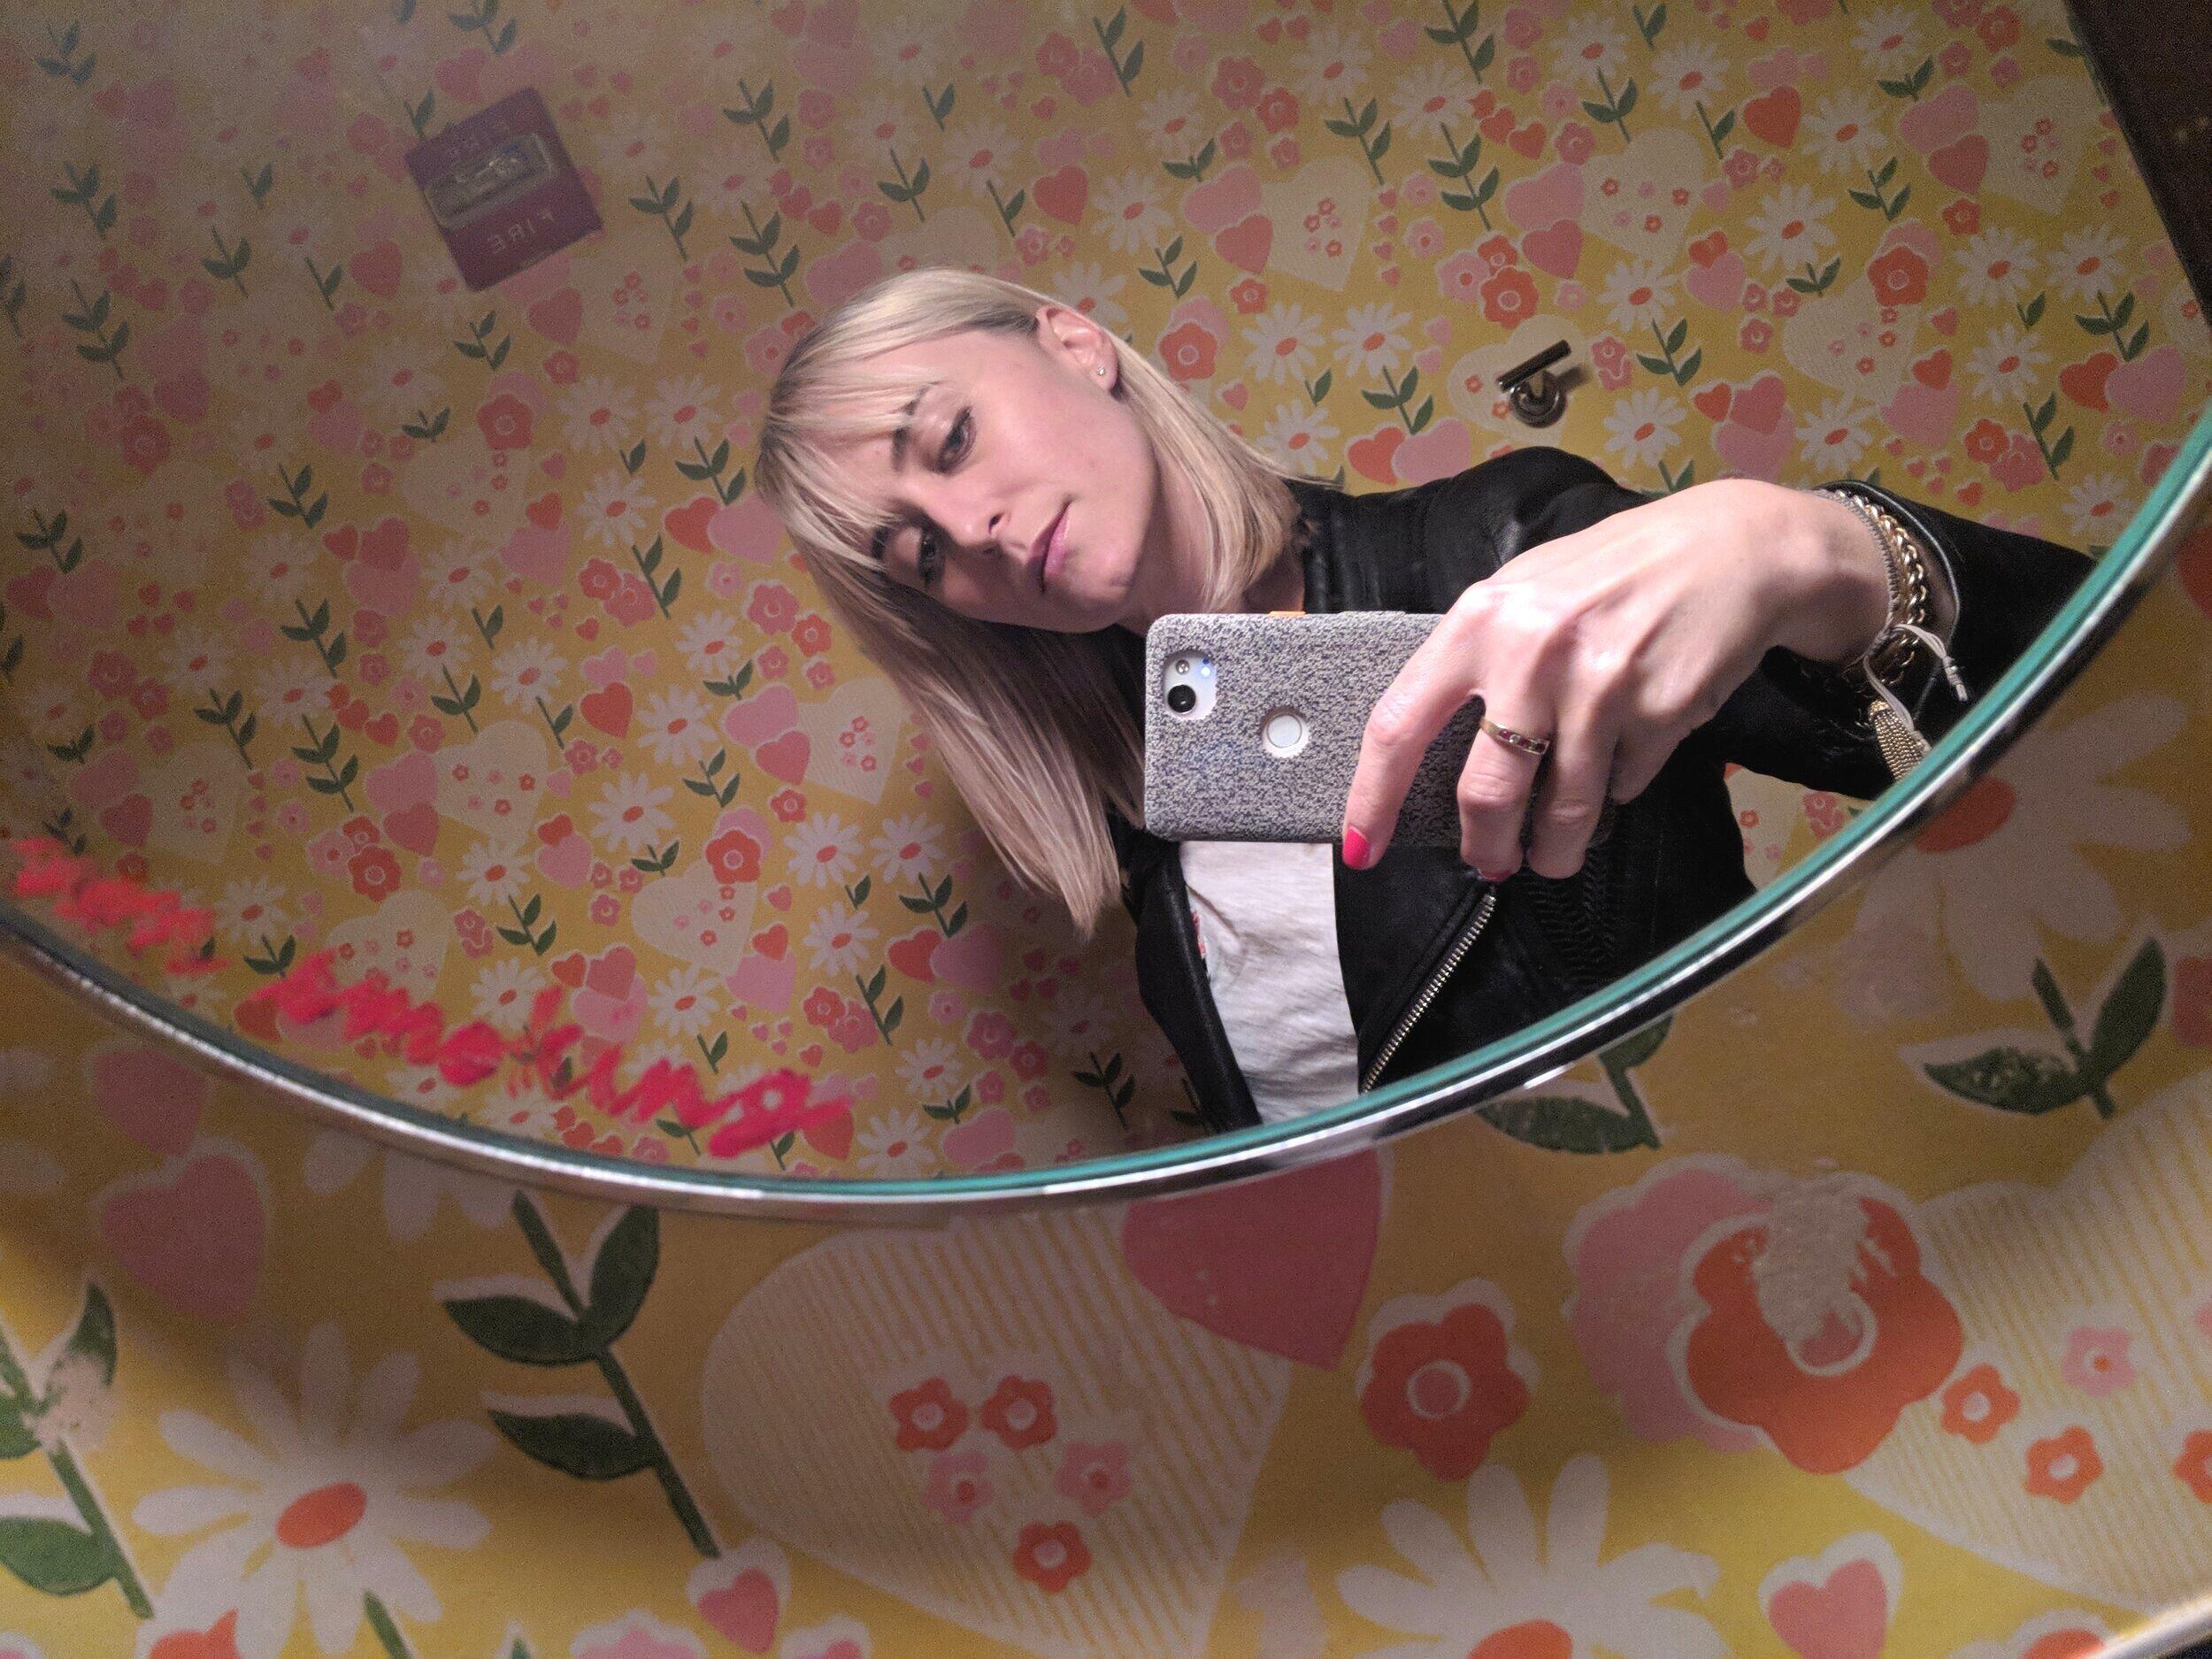 A fabulous bathroom with fabulous wallpaper, somewhere fabulous.